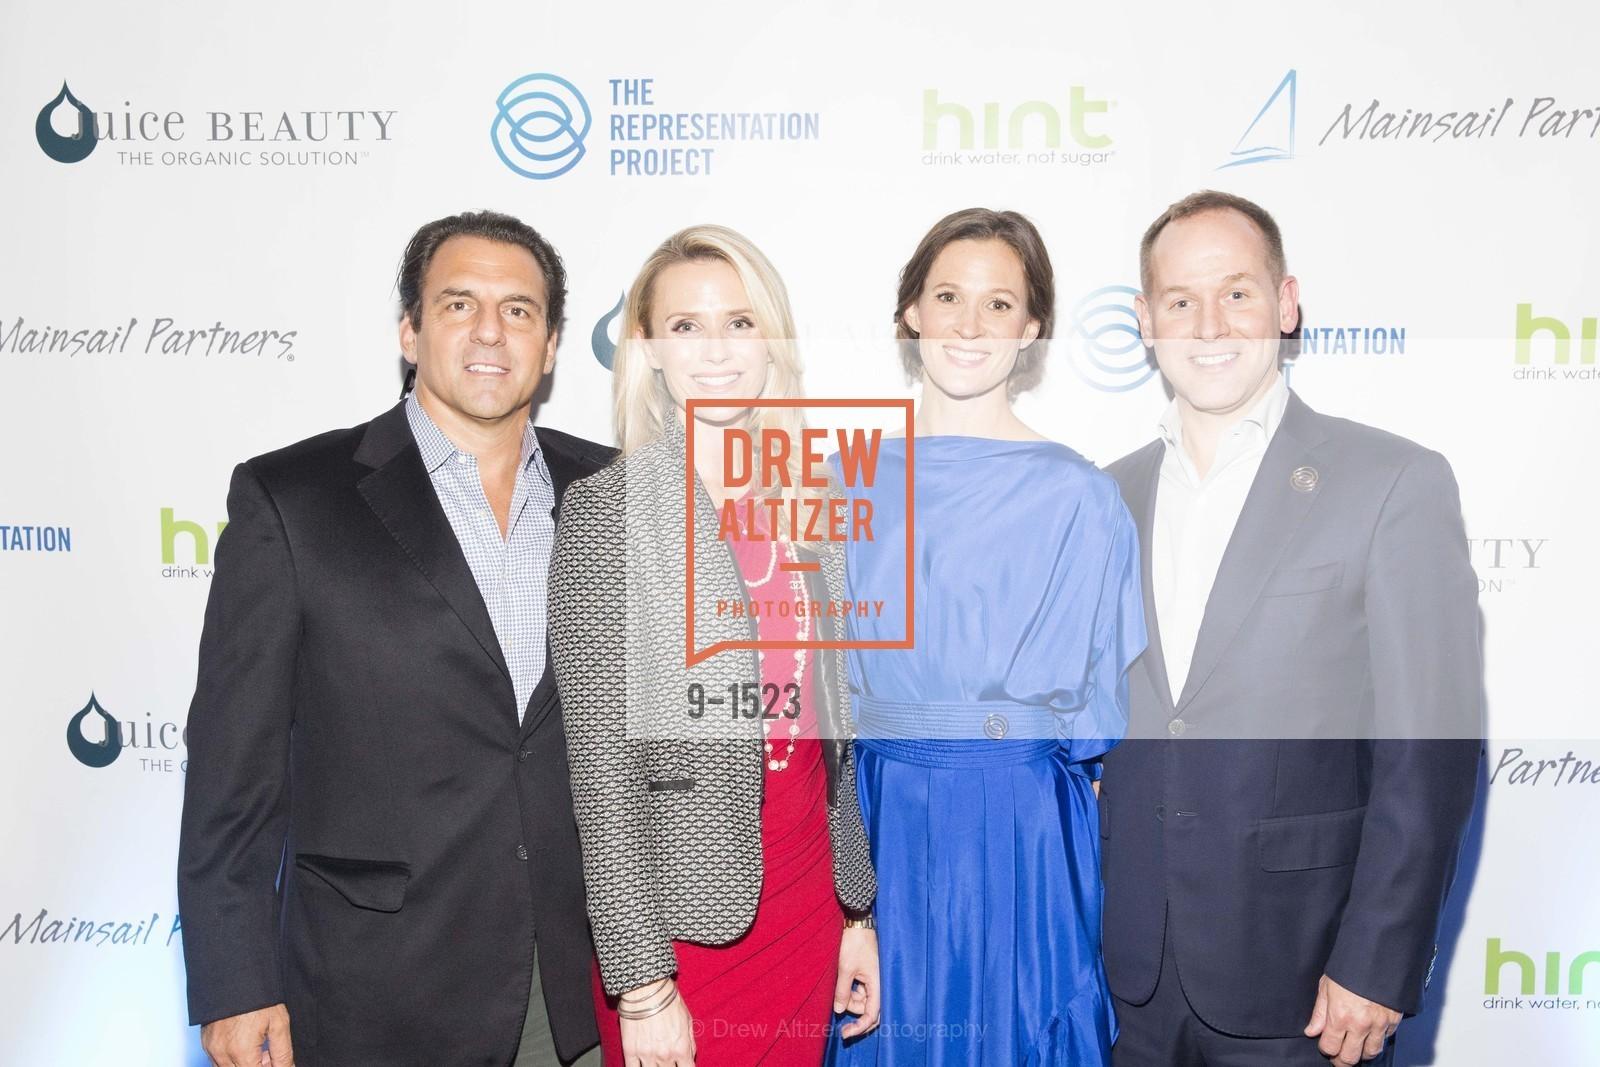 Andrew Zenoff, Jennifer Siebel Newsom, Allison Bloom, Gavin Turner, Photo #9-1523